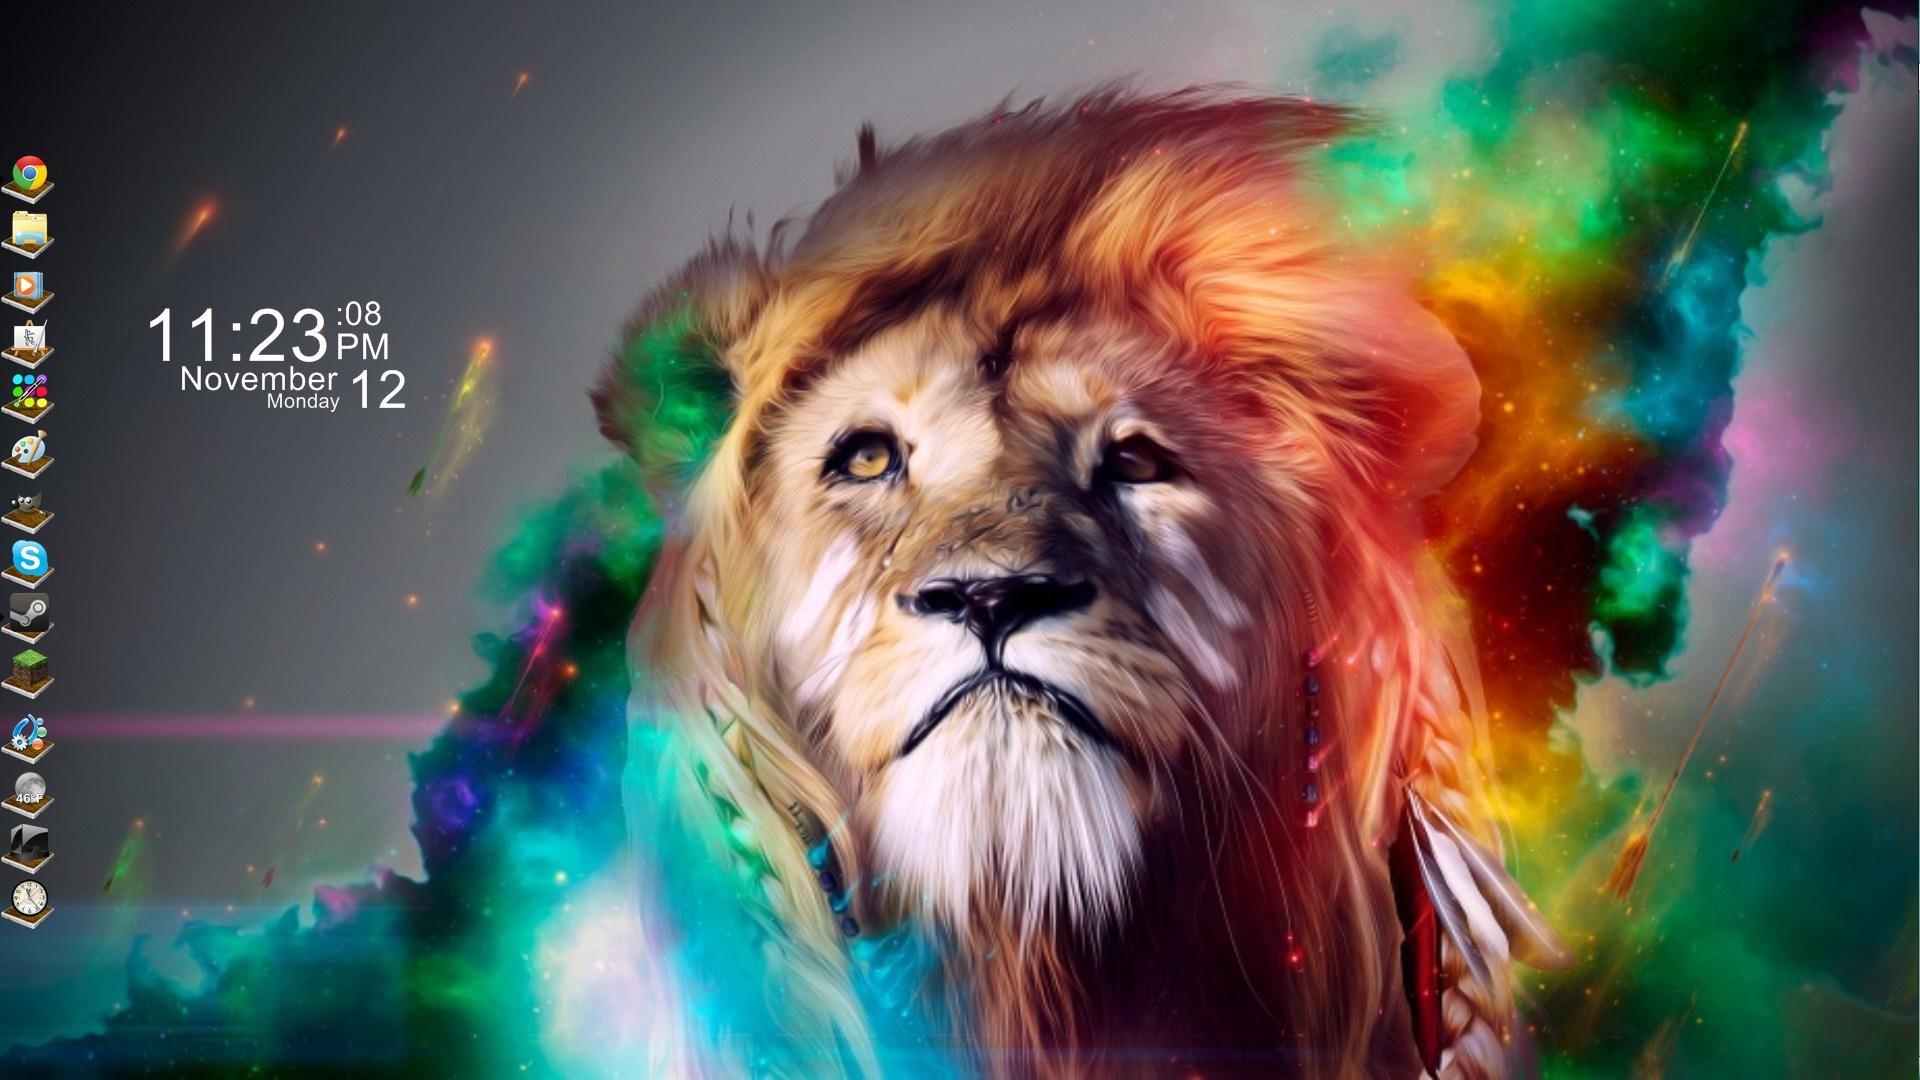 Explore Lion Wallpaper, Colorful Wallpaper, and more!